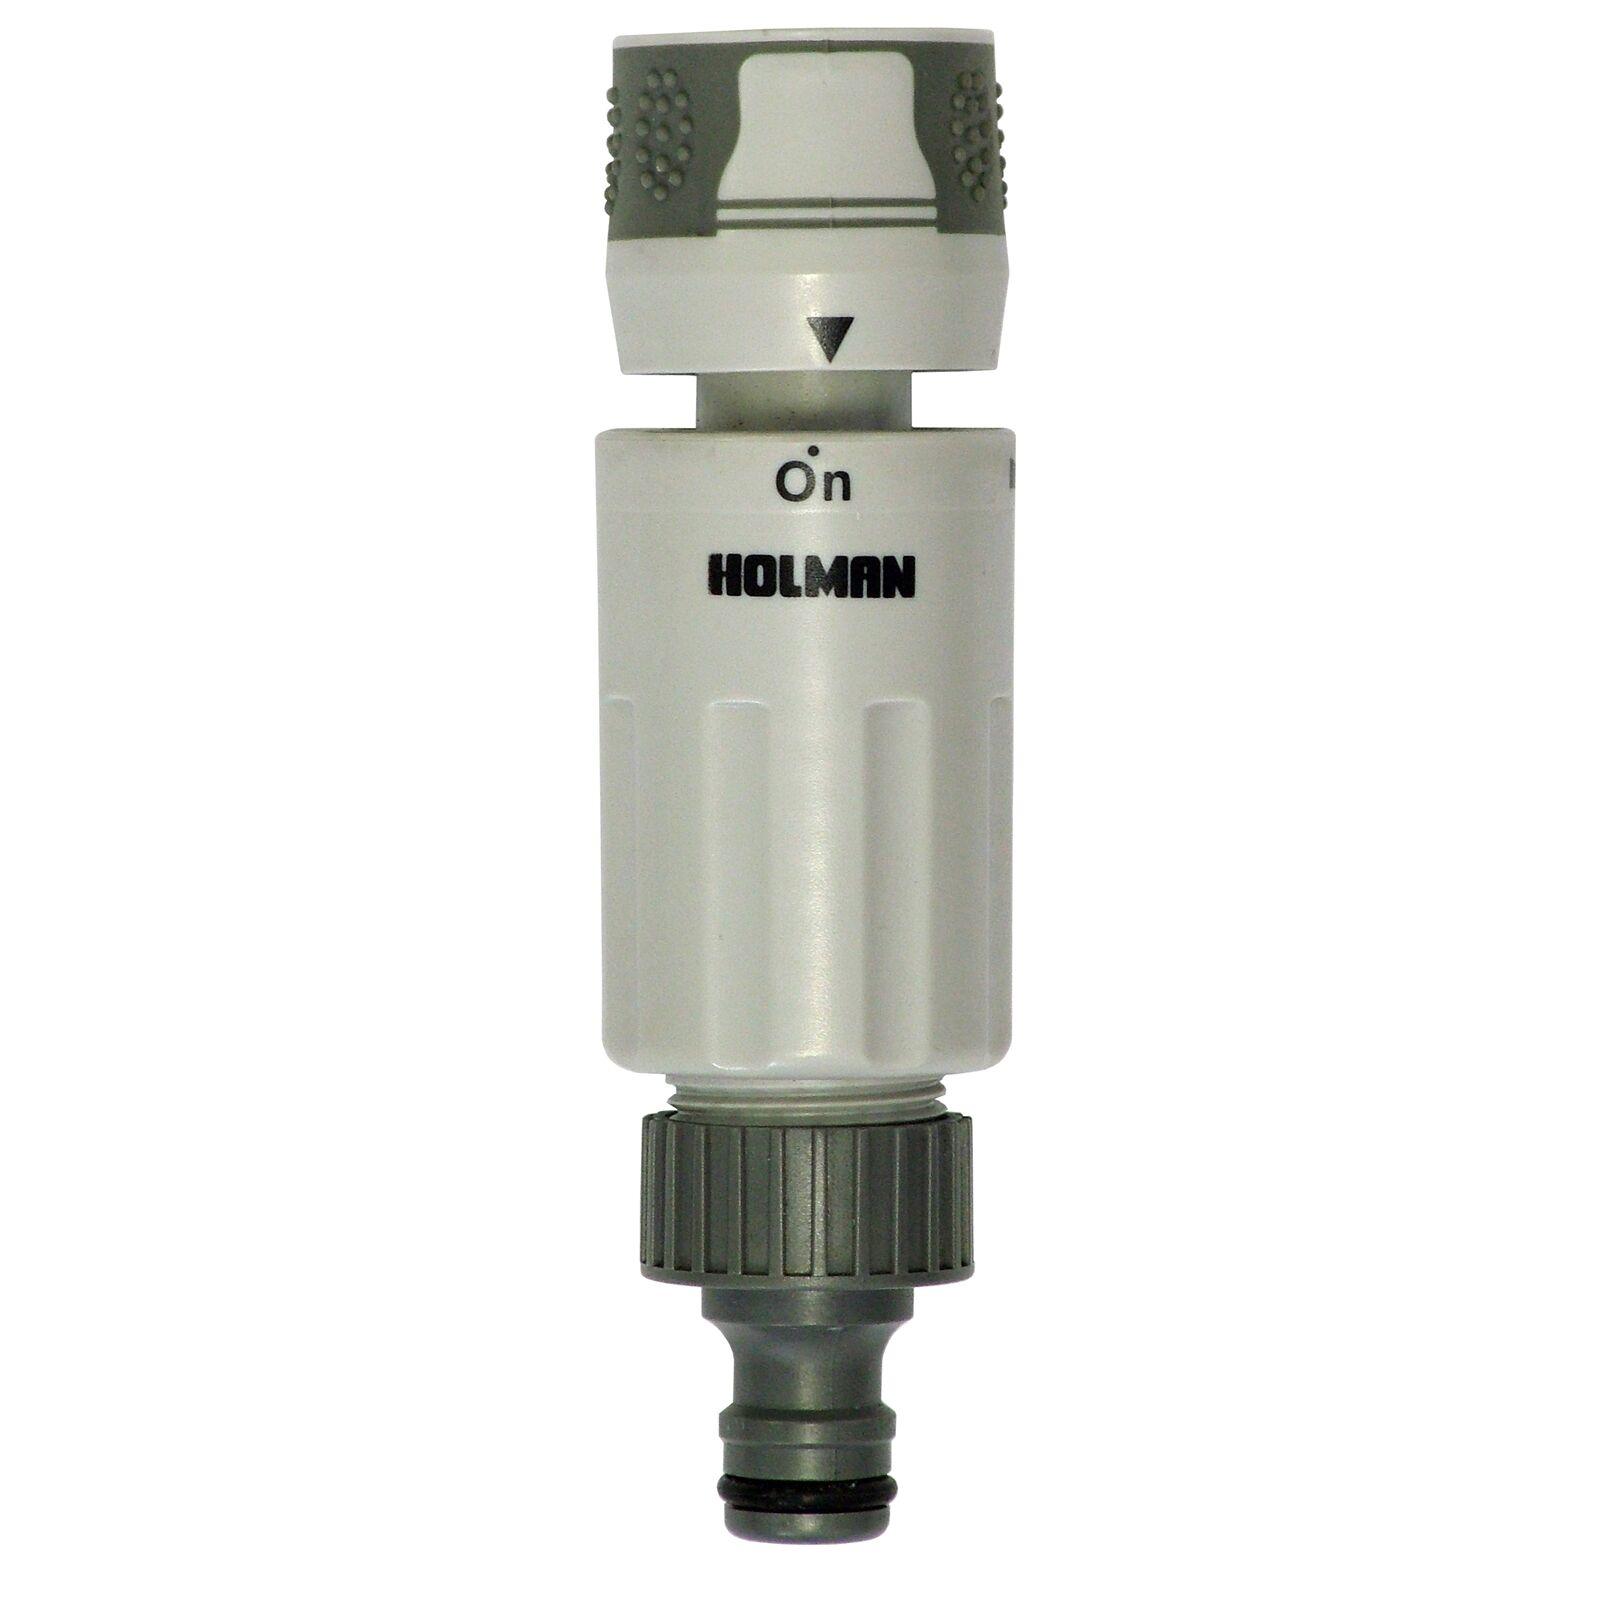 Holman TWIST FLOW HOSE FITTING CONNECTOR 12mm,3/4 Inch BSP Male Thread*AUS Brand